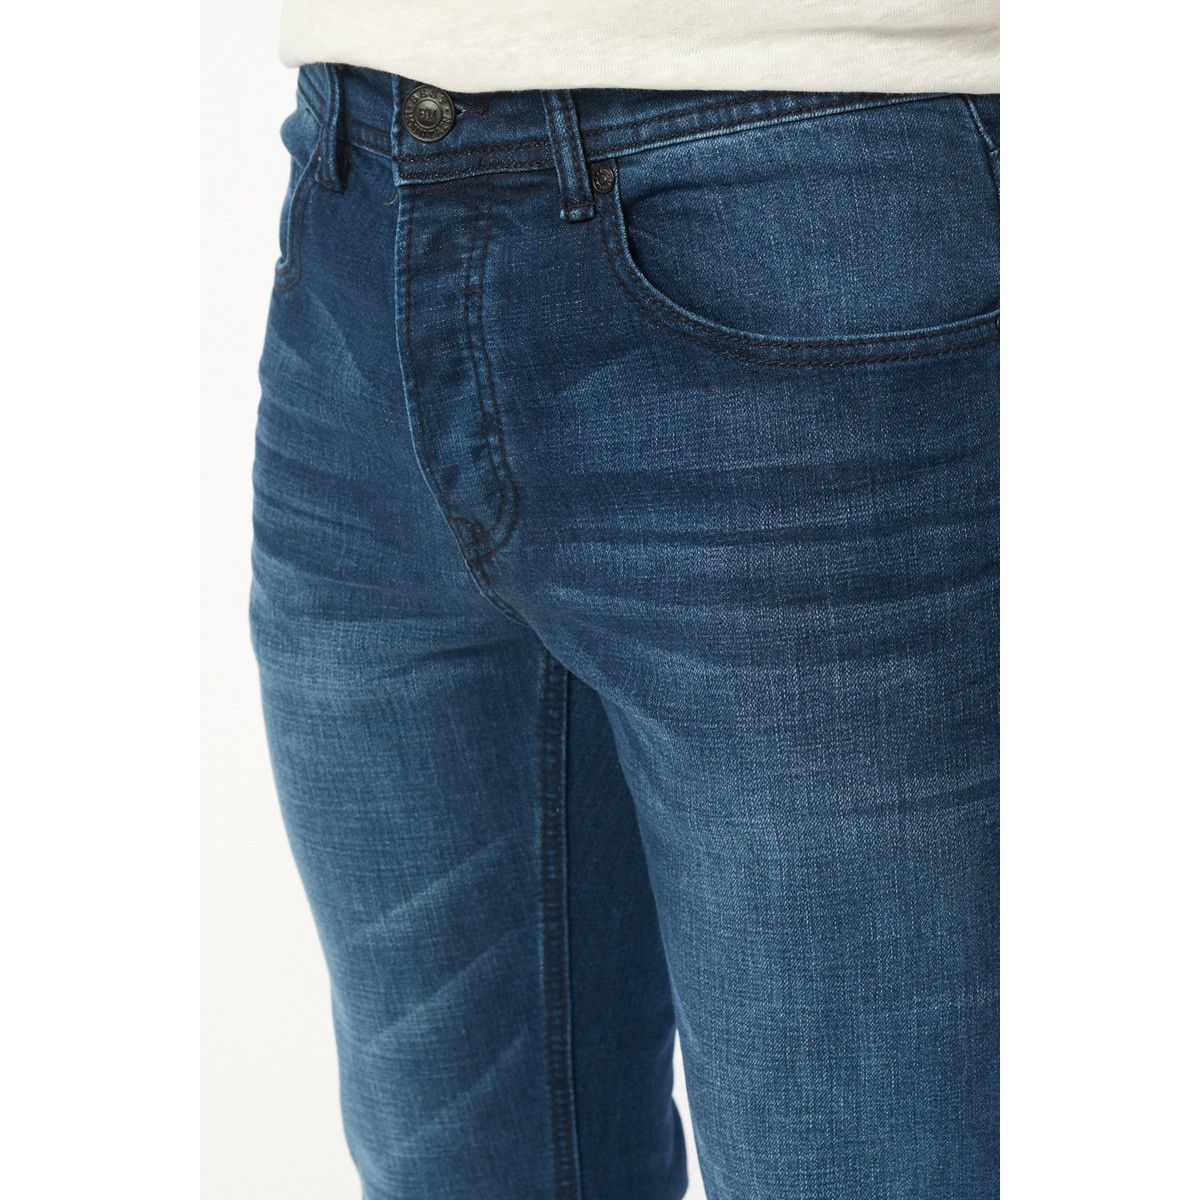 Trench//Veste//Jacket Femme//Woman Taille 36-38-40-42 bleu marine NEUF